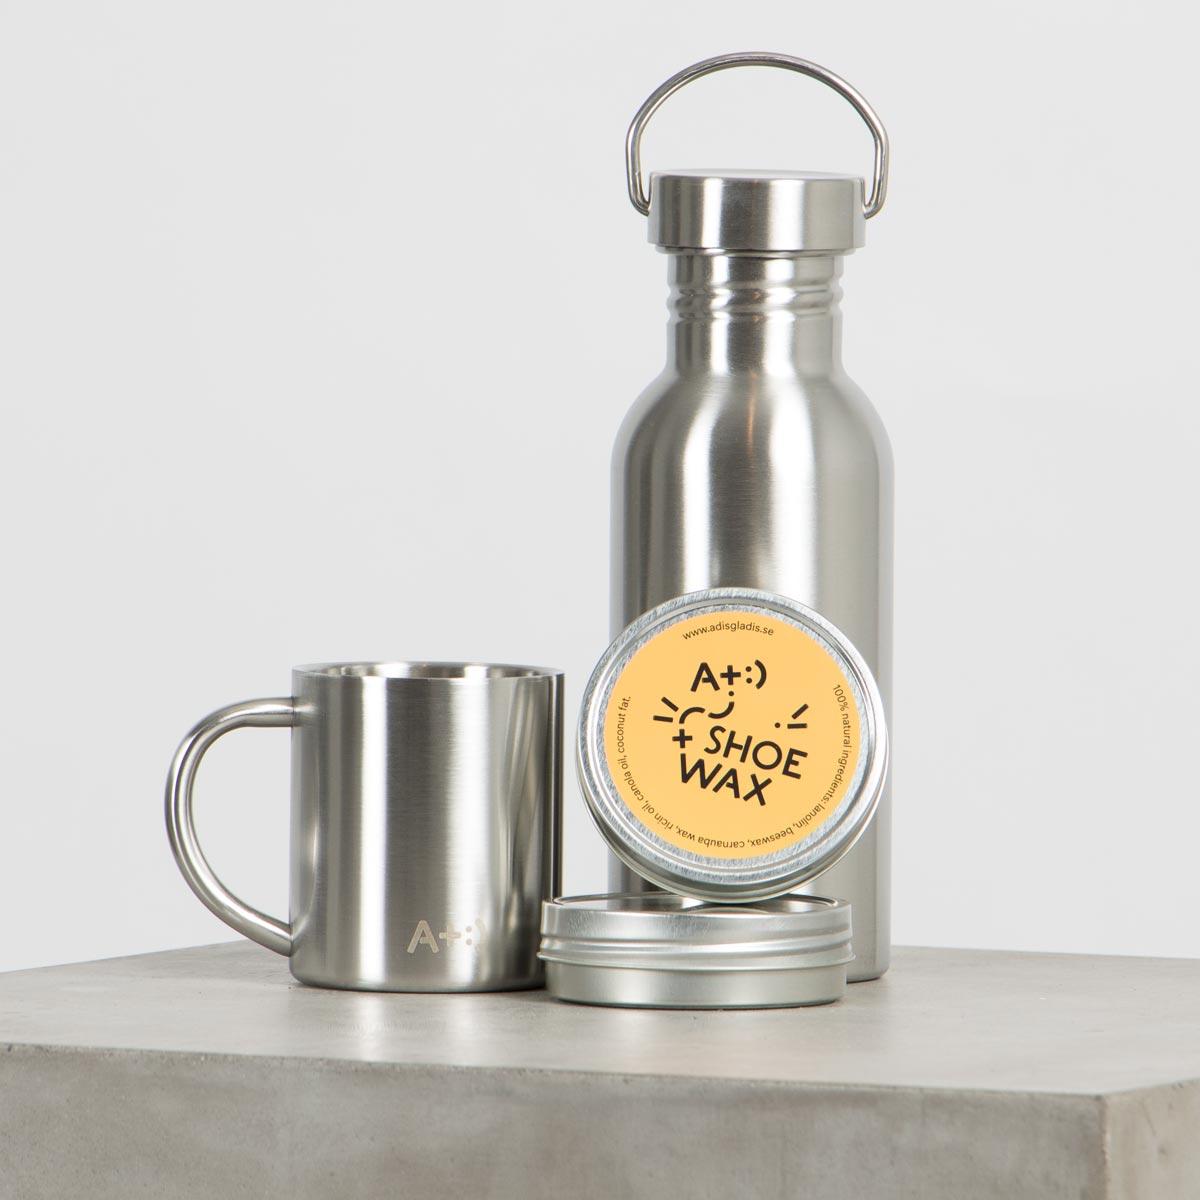 adisgladis-shoe-wax-water-bottle-insulated-mug